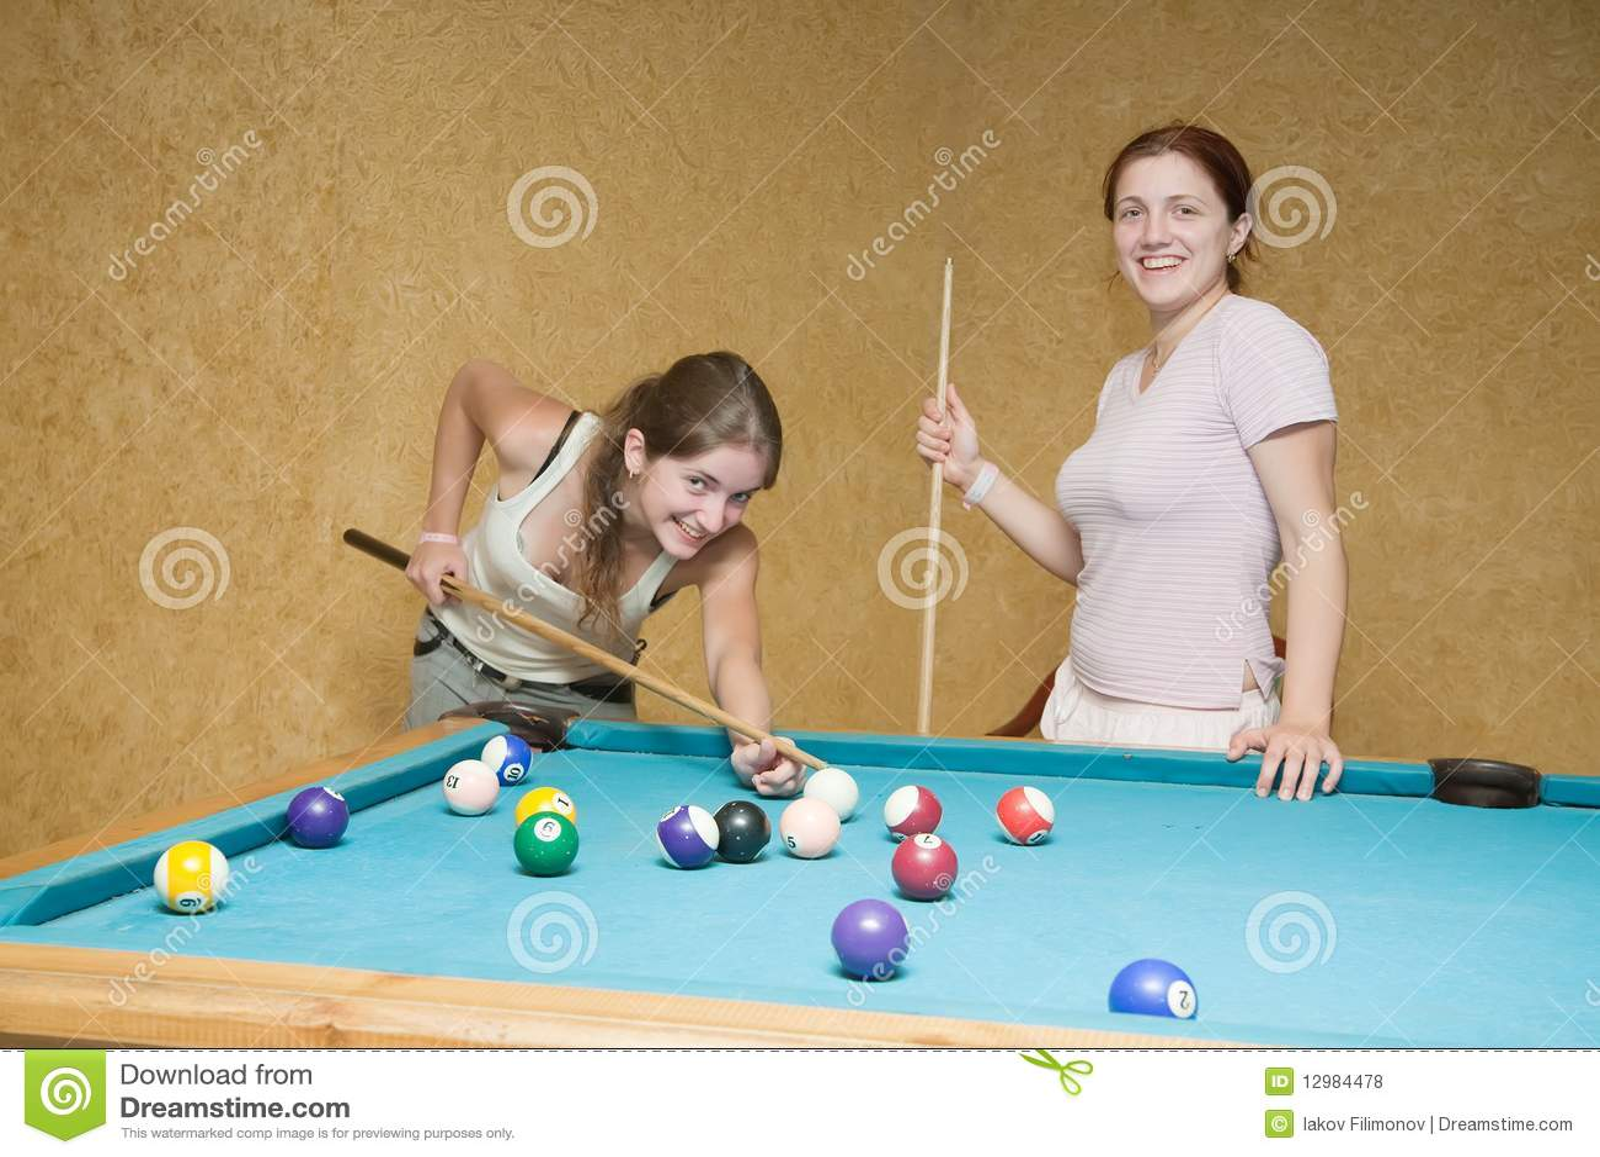 Women Playing Billiards Royalty Free Stock Photos Image